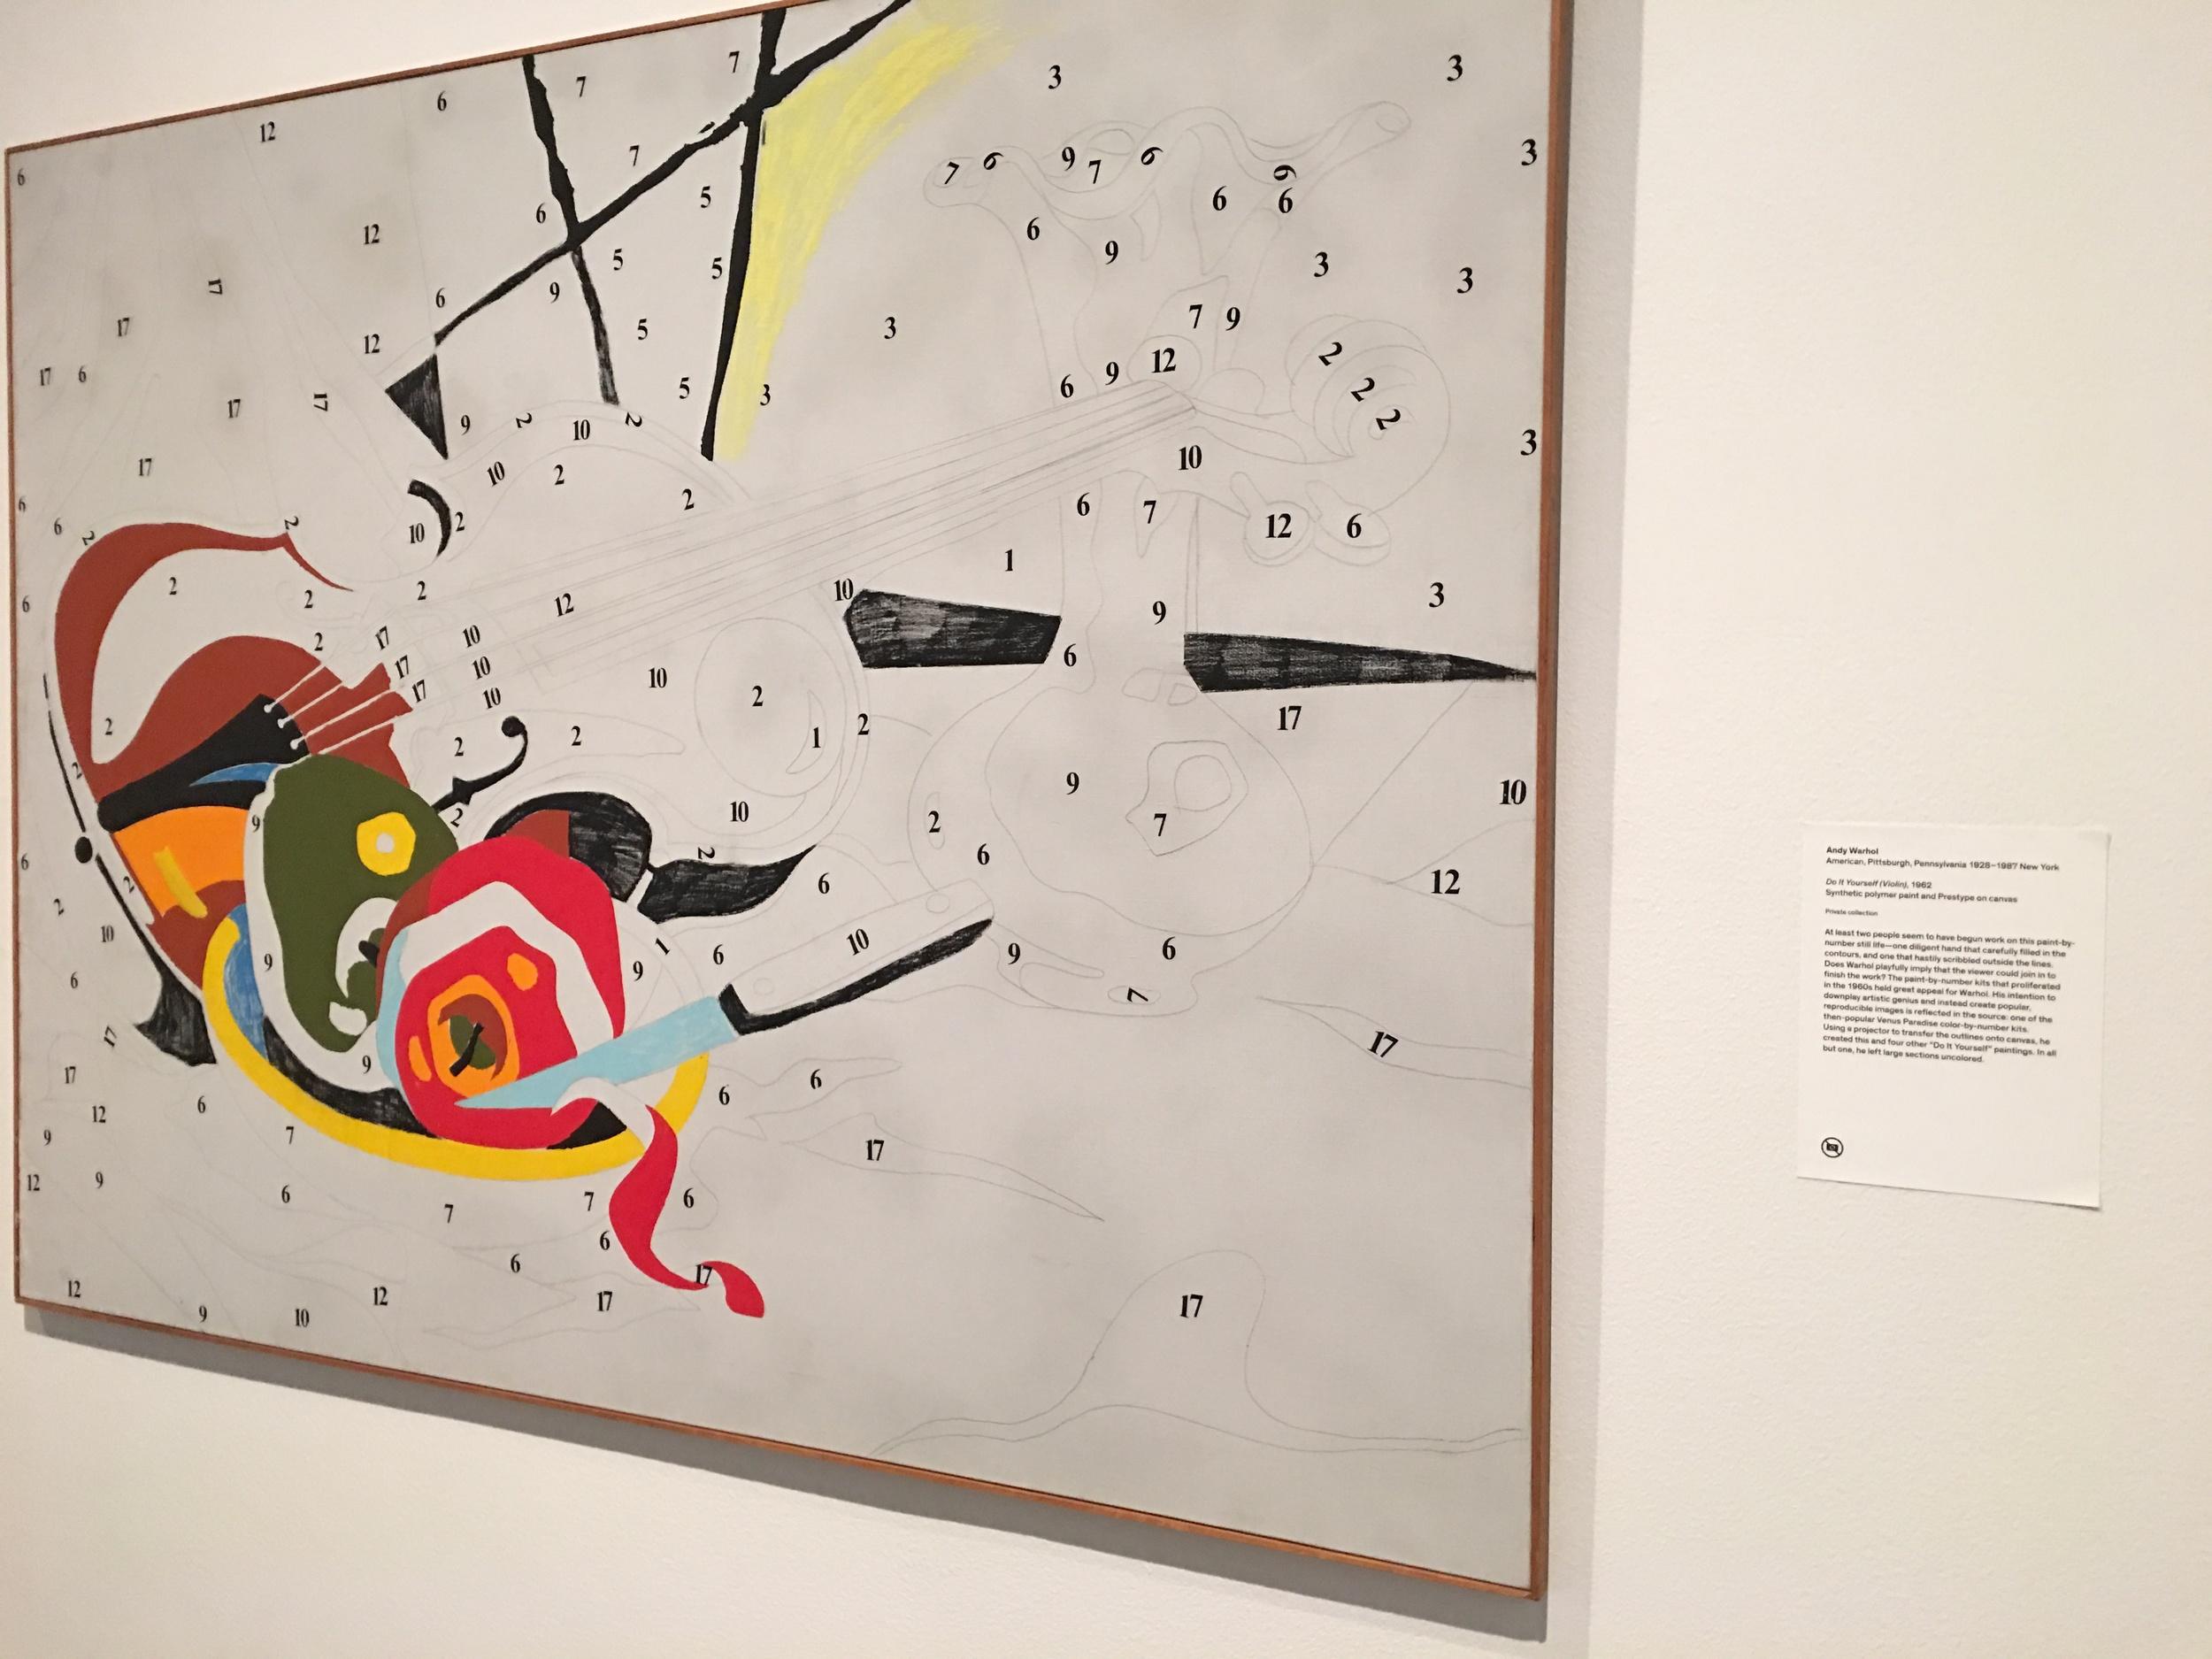 Andy Warhol, Do It Yourself, Violin, 1962